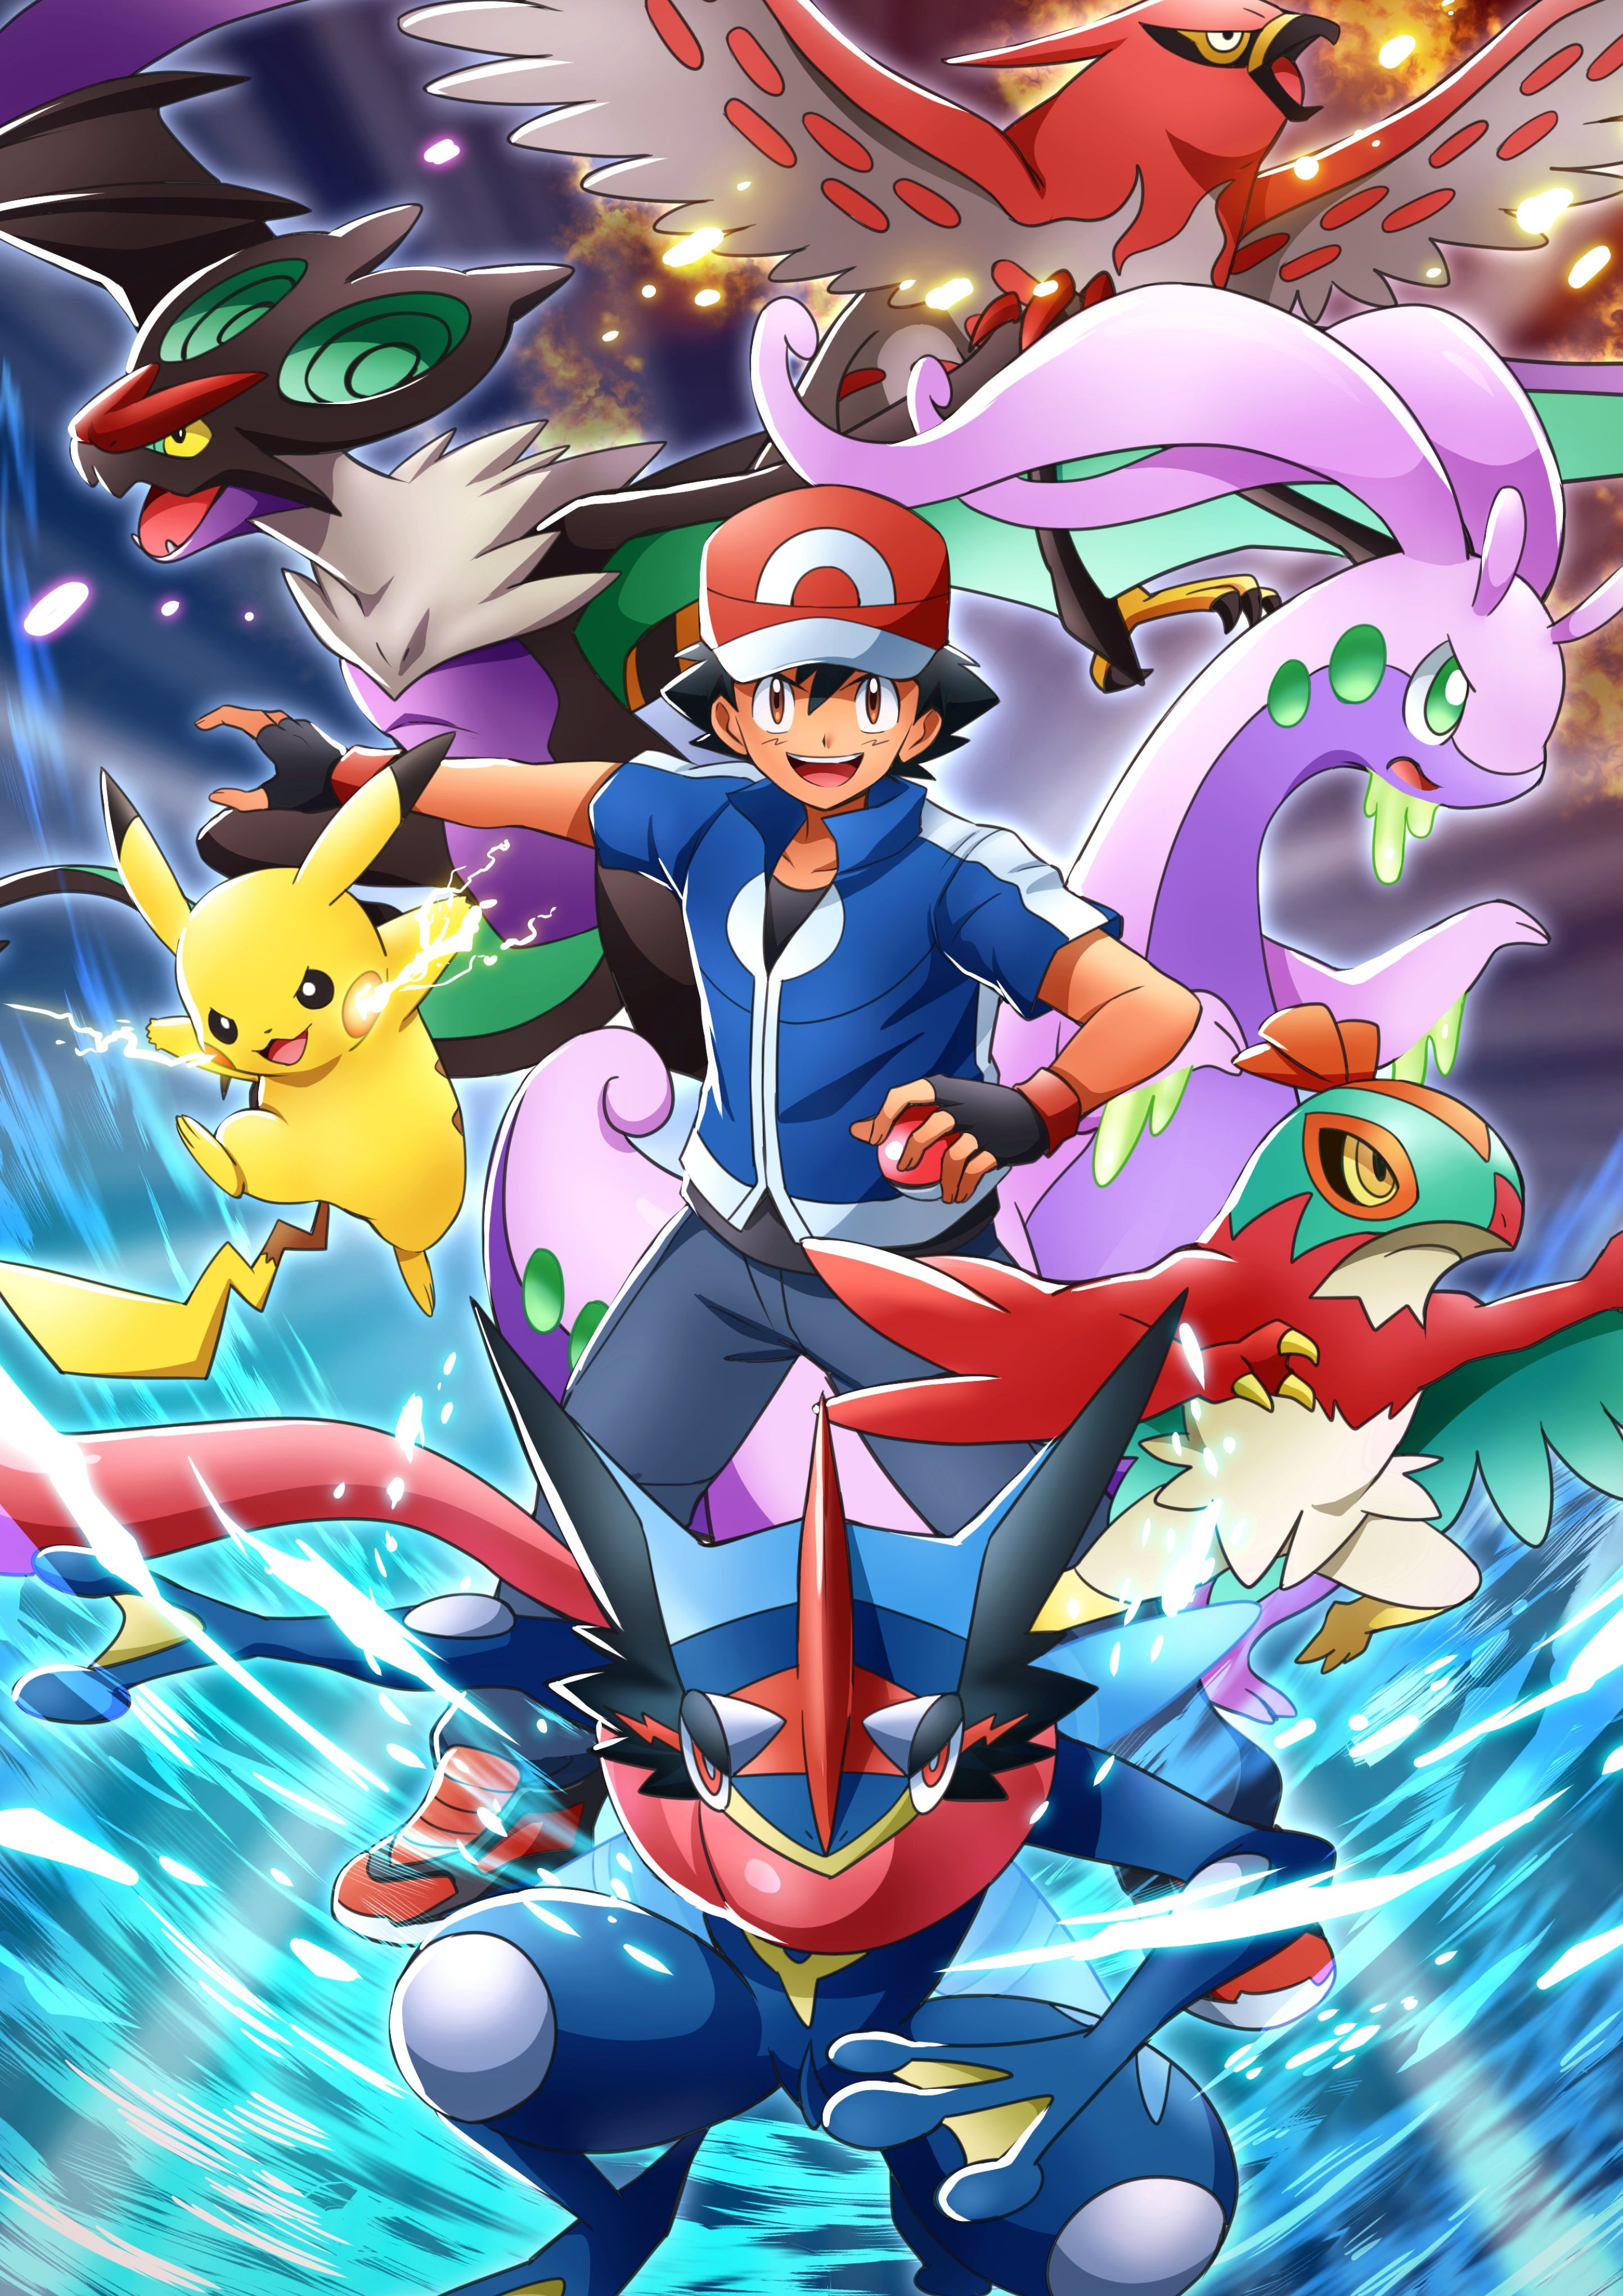 Pokemon Ash Greninja Wallpapers - Top Free Pokemon Ash ...